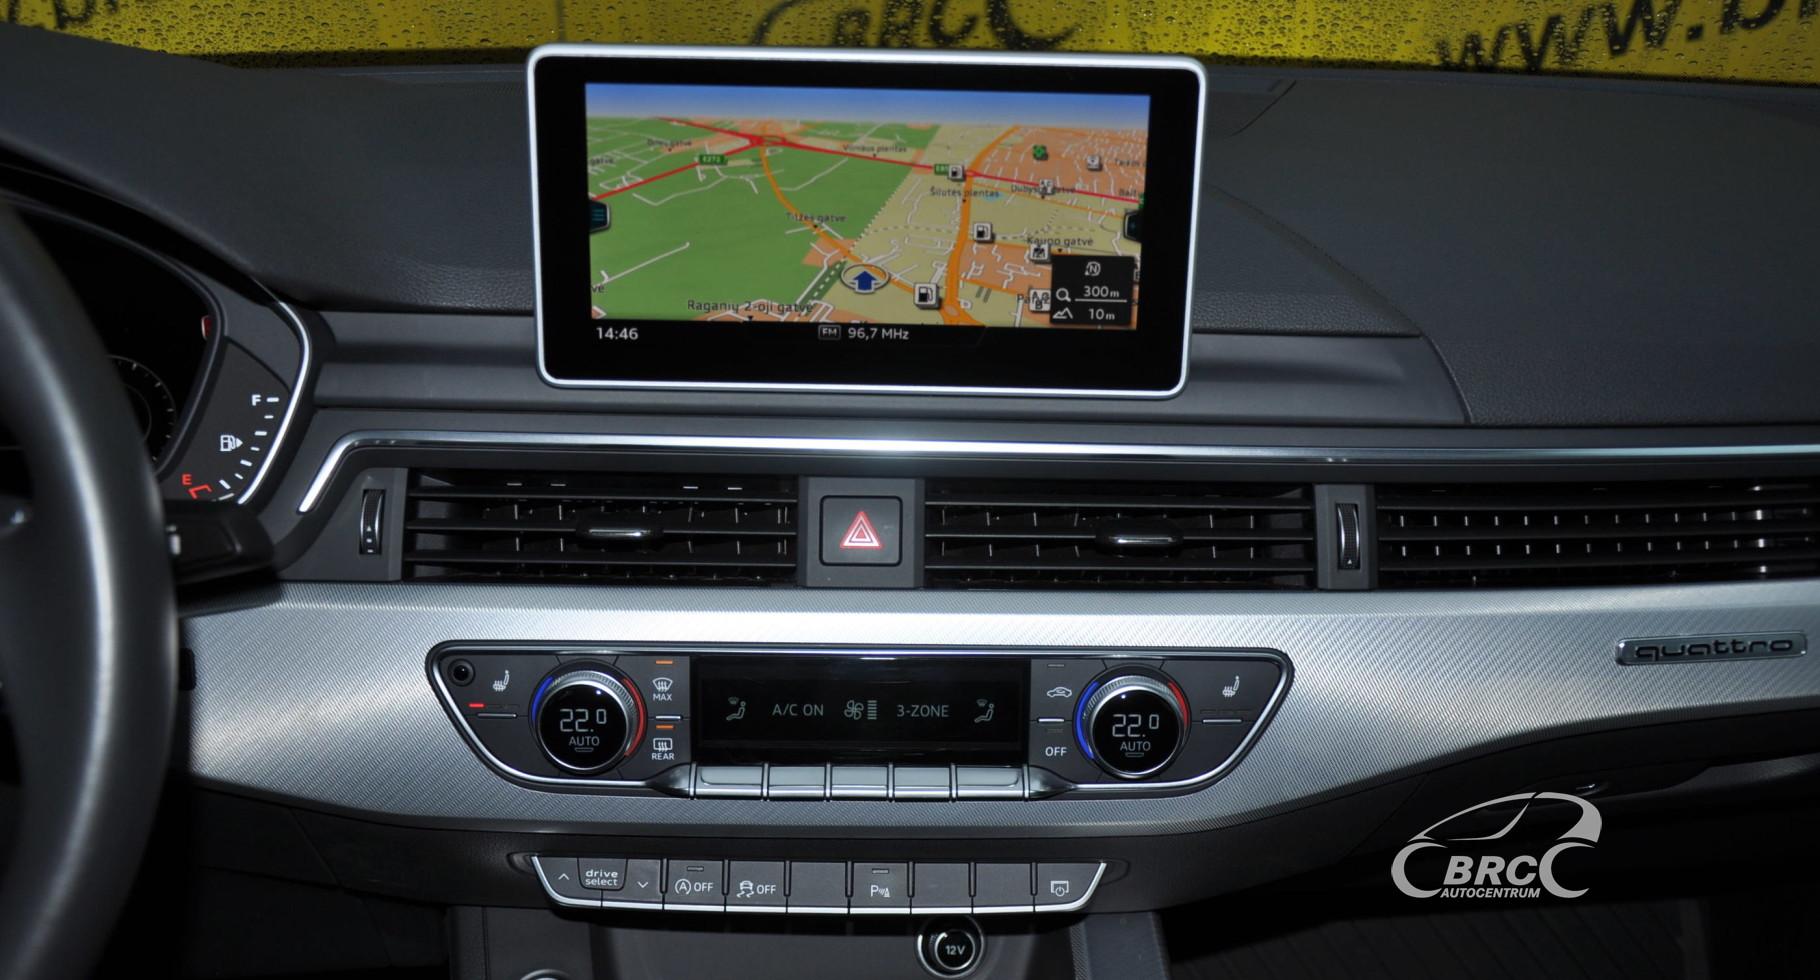 Audi A4 2.0 TFSI Quattro S-Line Automatas